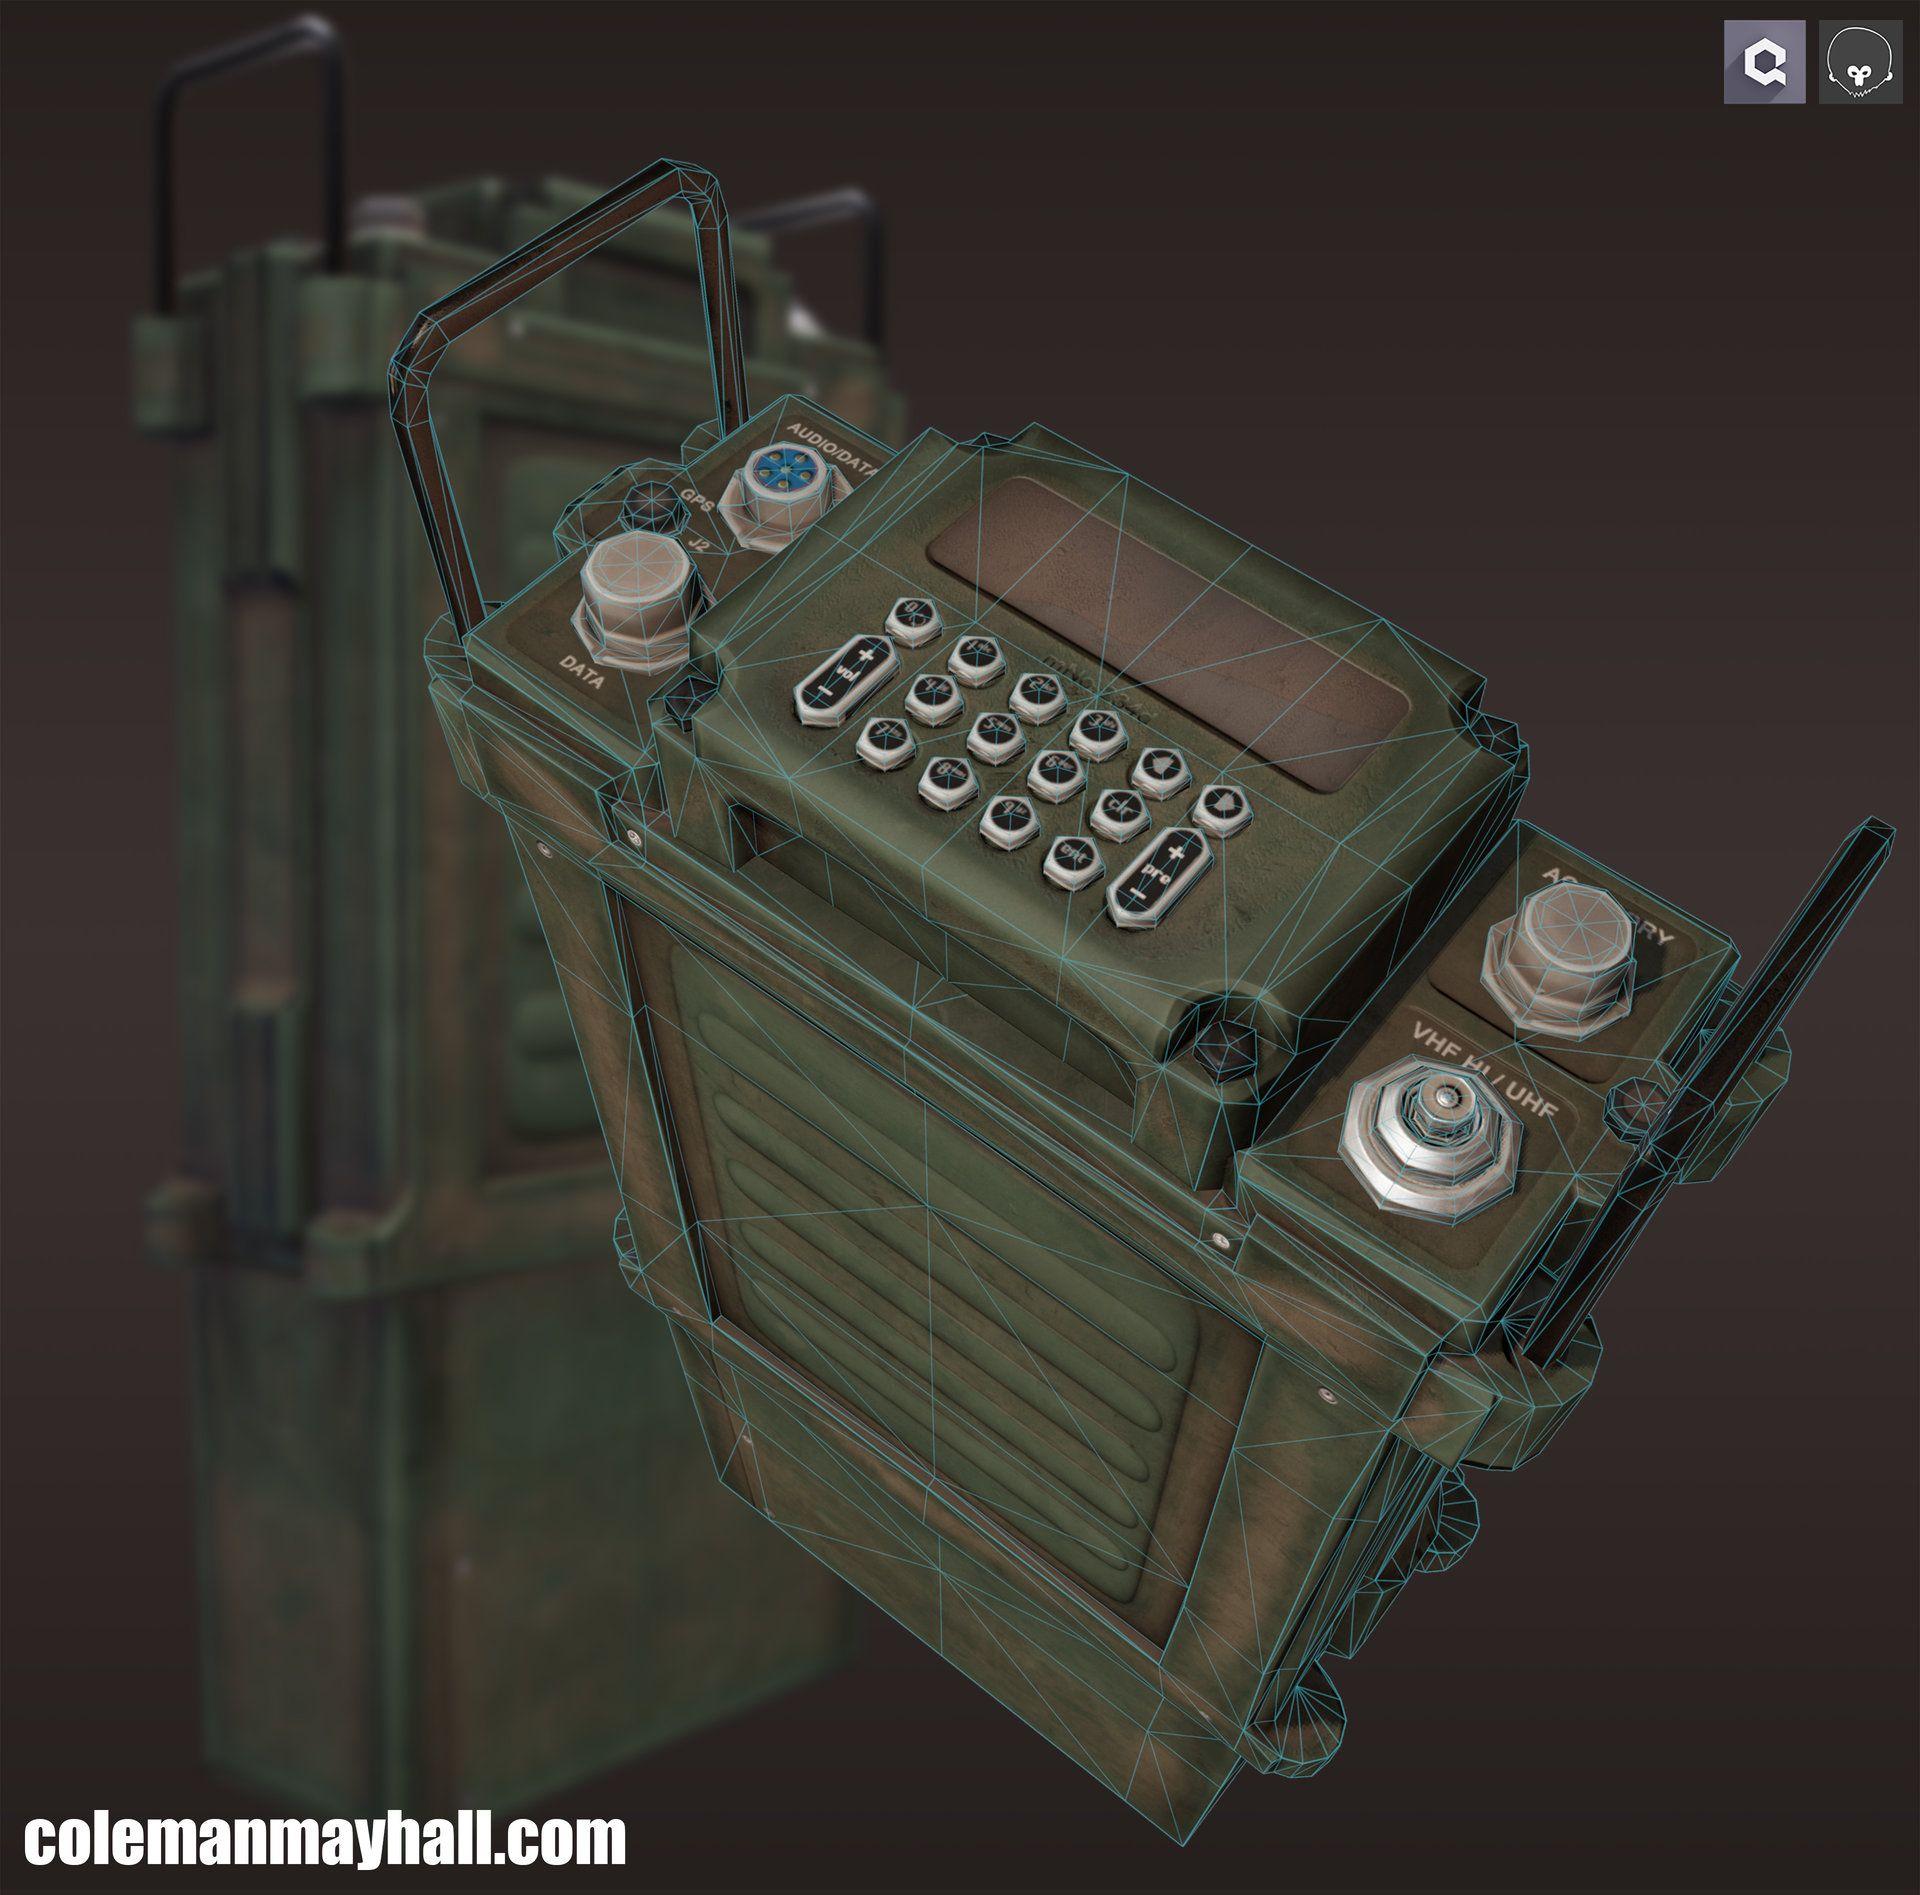 ArtStation - PRC 117 Radio, Coleman Mayhall | object